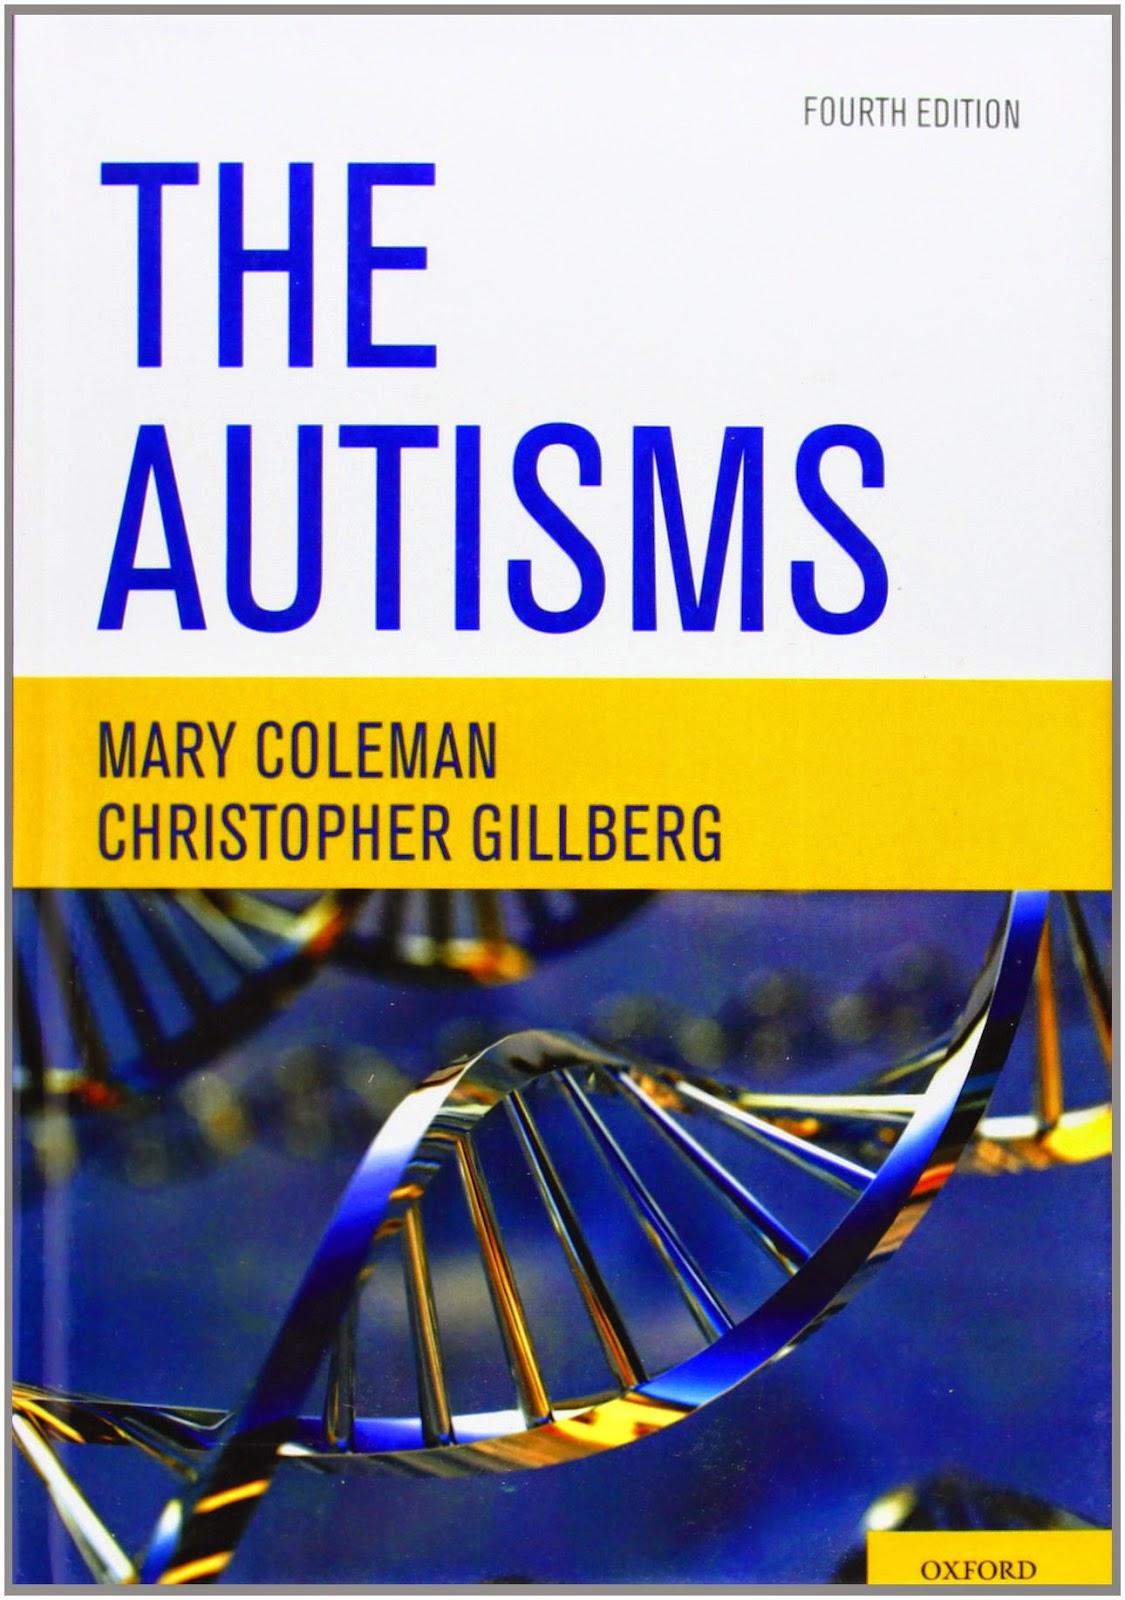 http://kingcheapebook.blogspot.com/2014/08/the-autisms.html